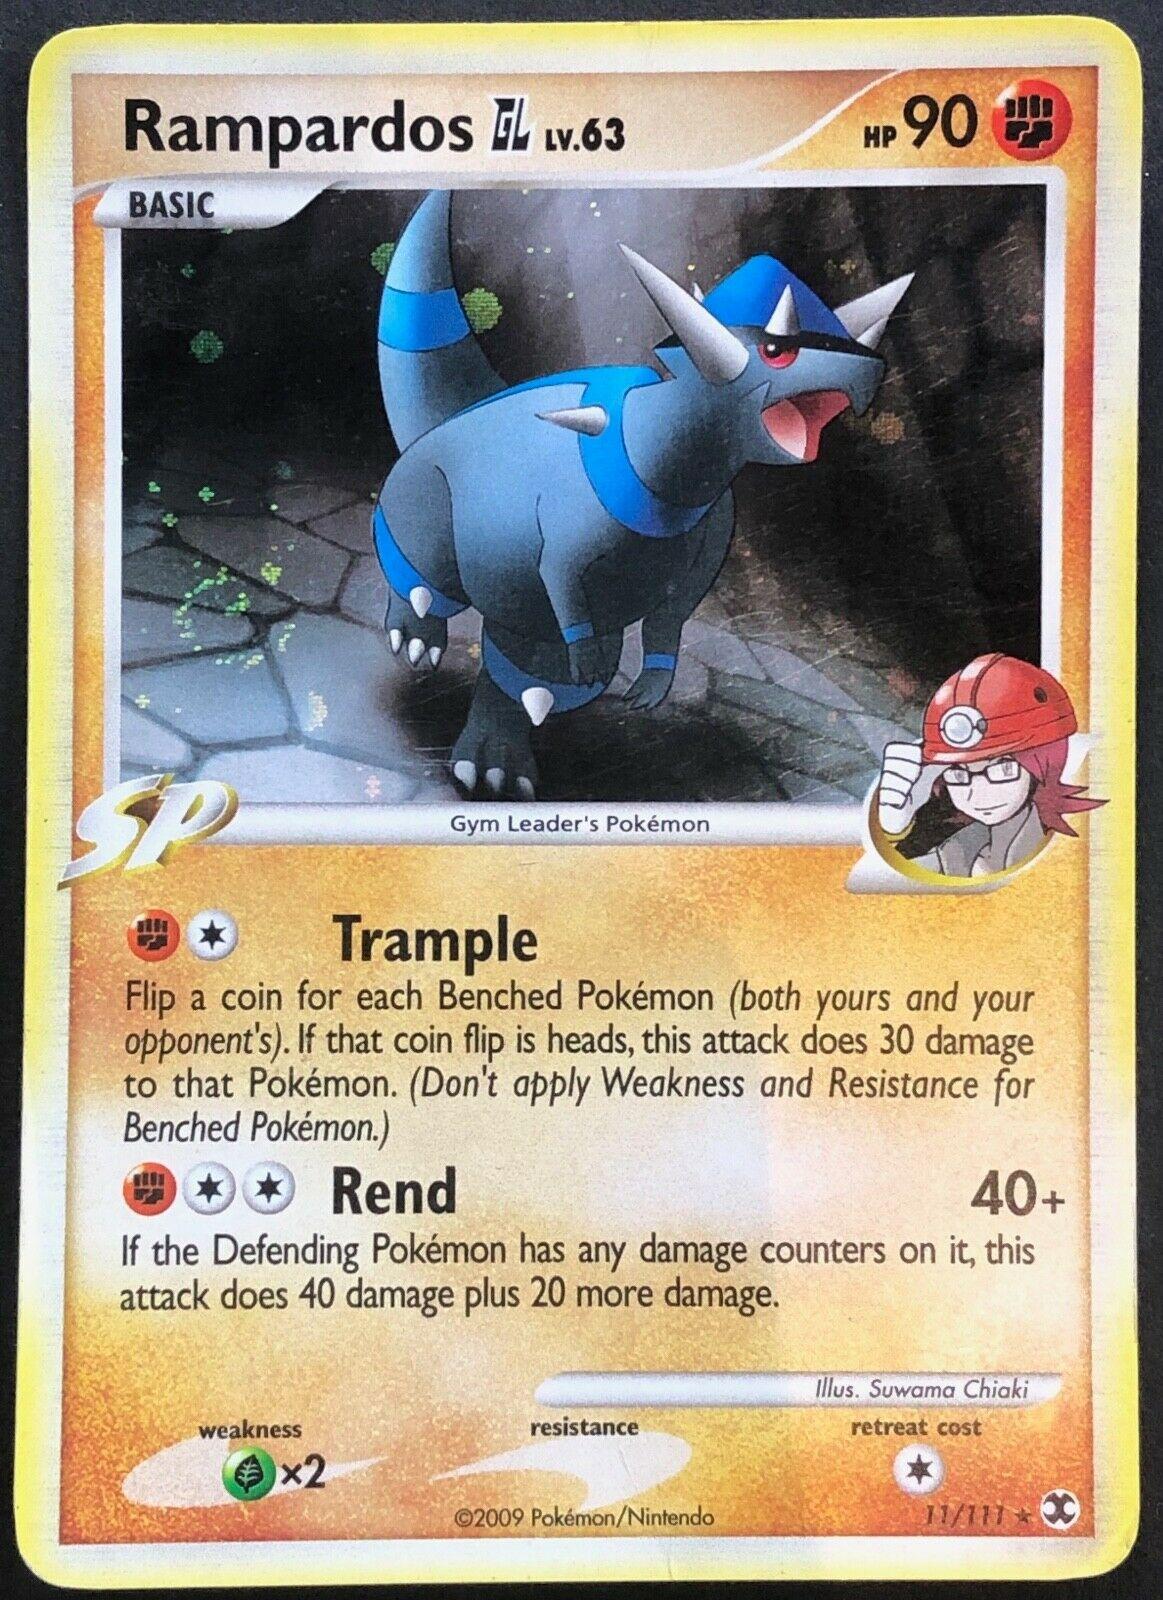 Http Www Pokemon Gl Com : pokemon, Rampardos, 11/111, Value:, [scrape_image:10] <script type=